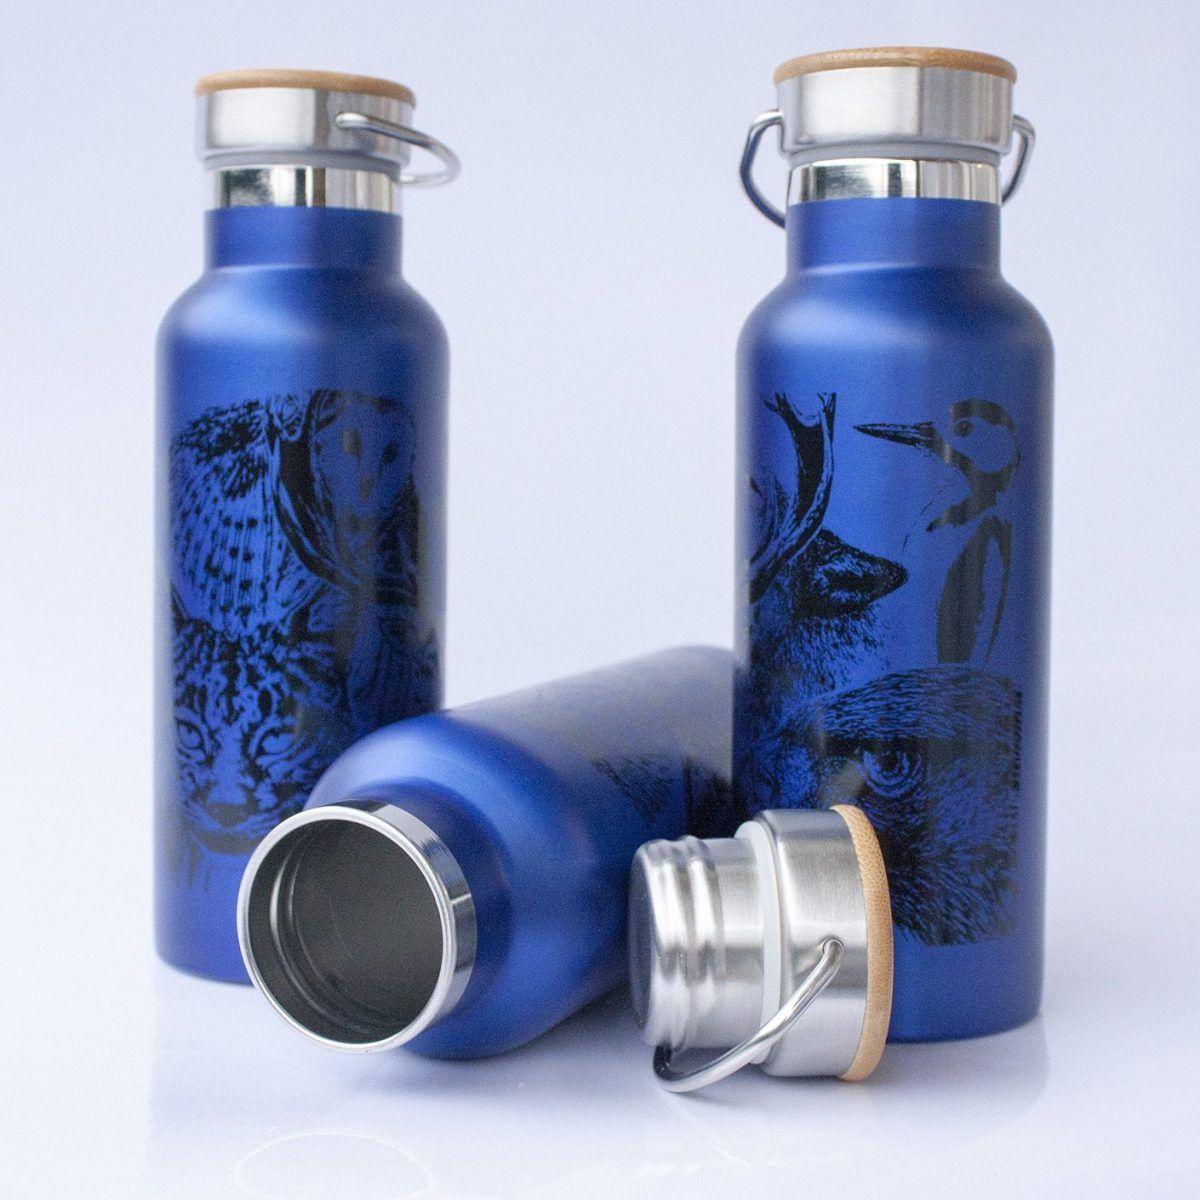 botella termo reutilizable-acero inoxidable-500ml-dibujos animales-zero waste-azul